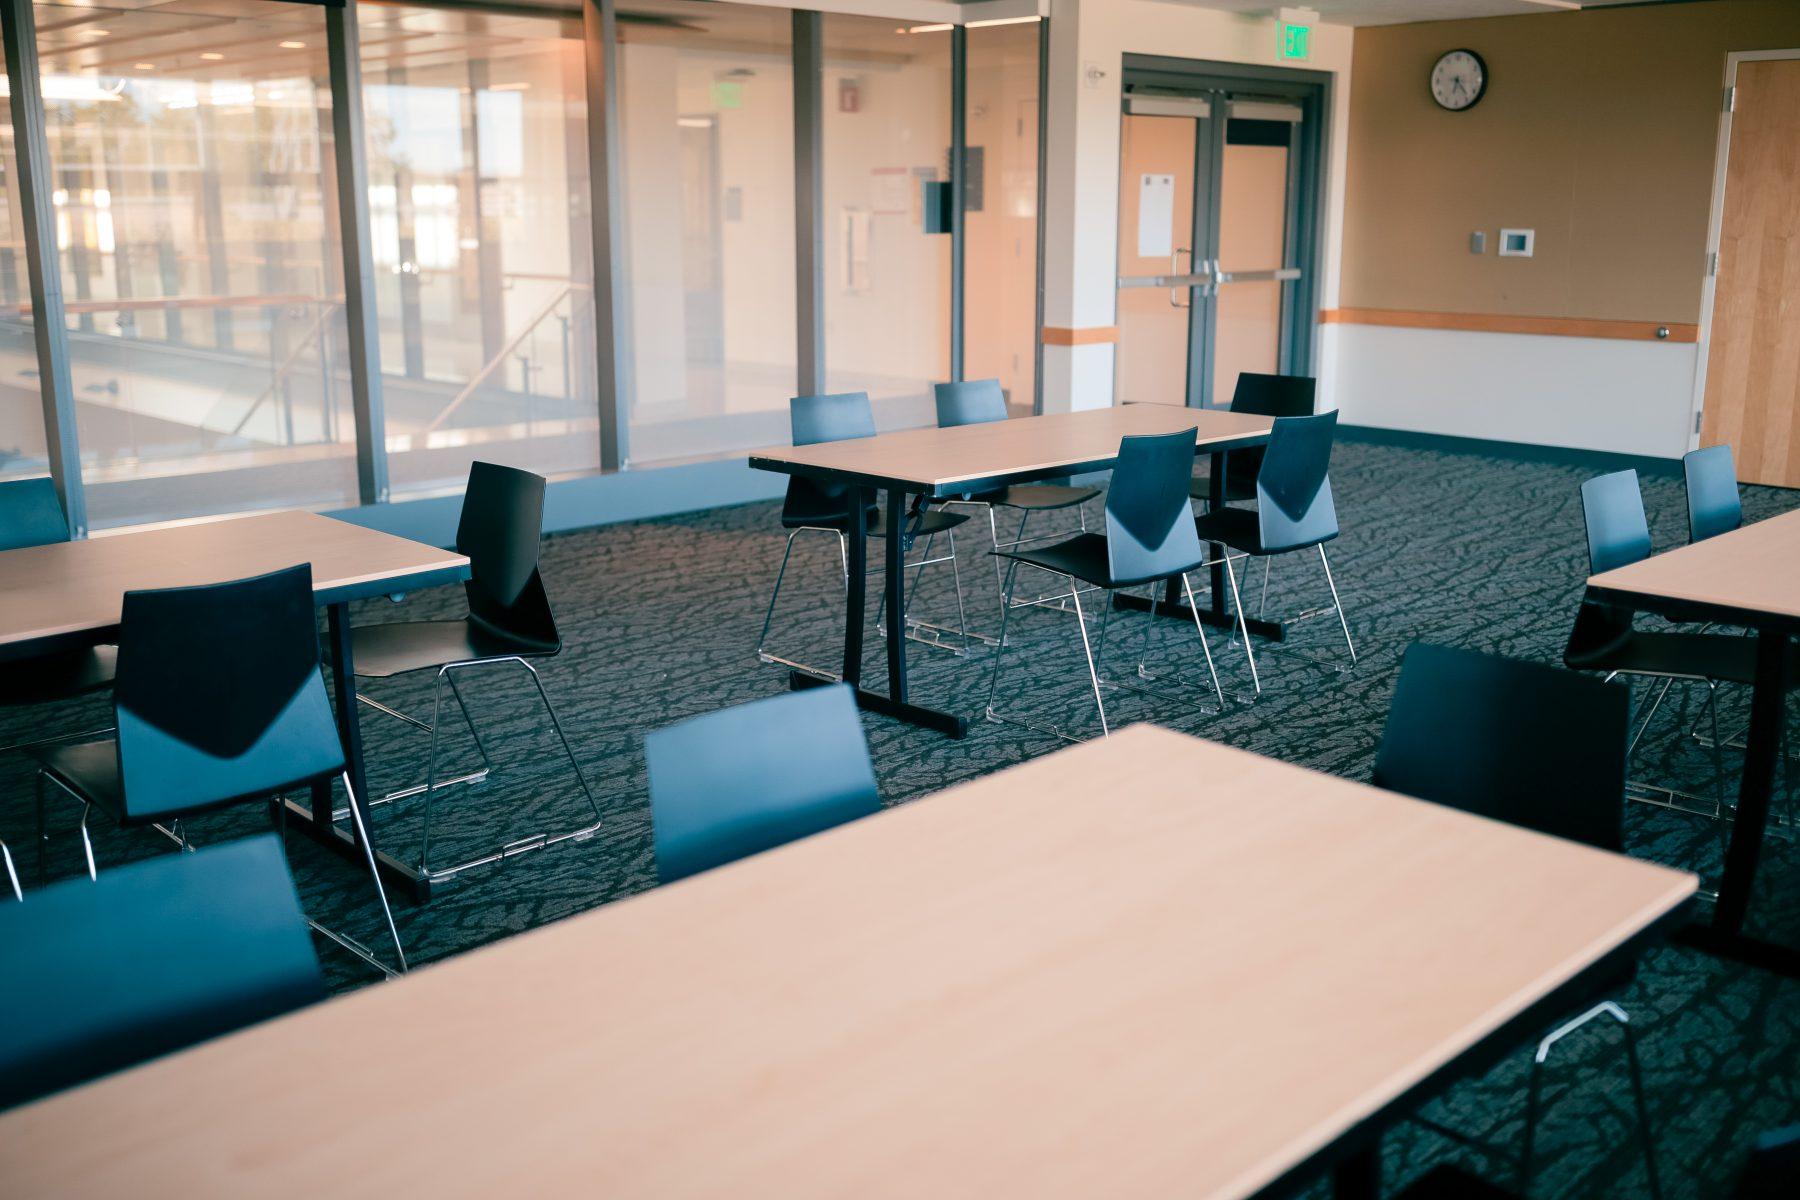 Seminar set, 1 - 6' table can seat 5 people